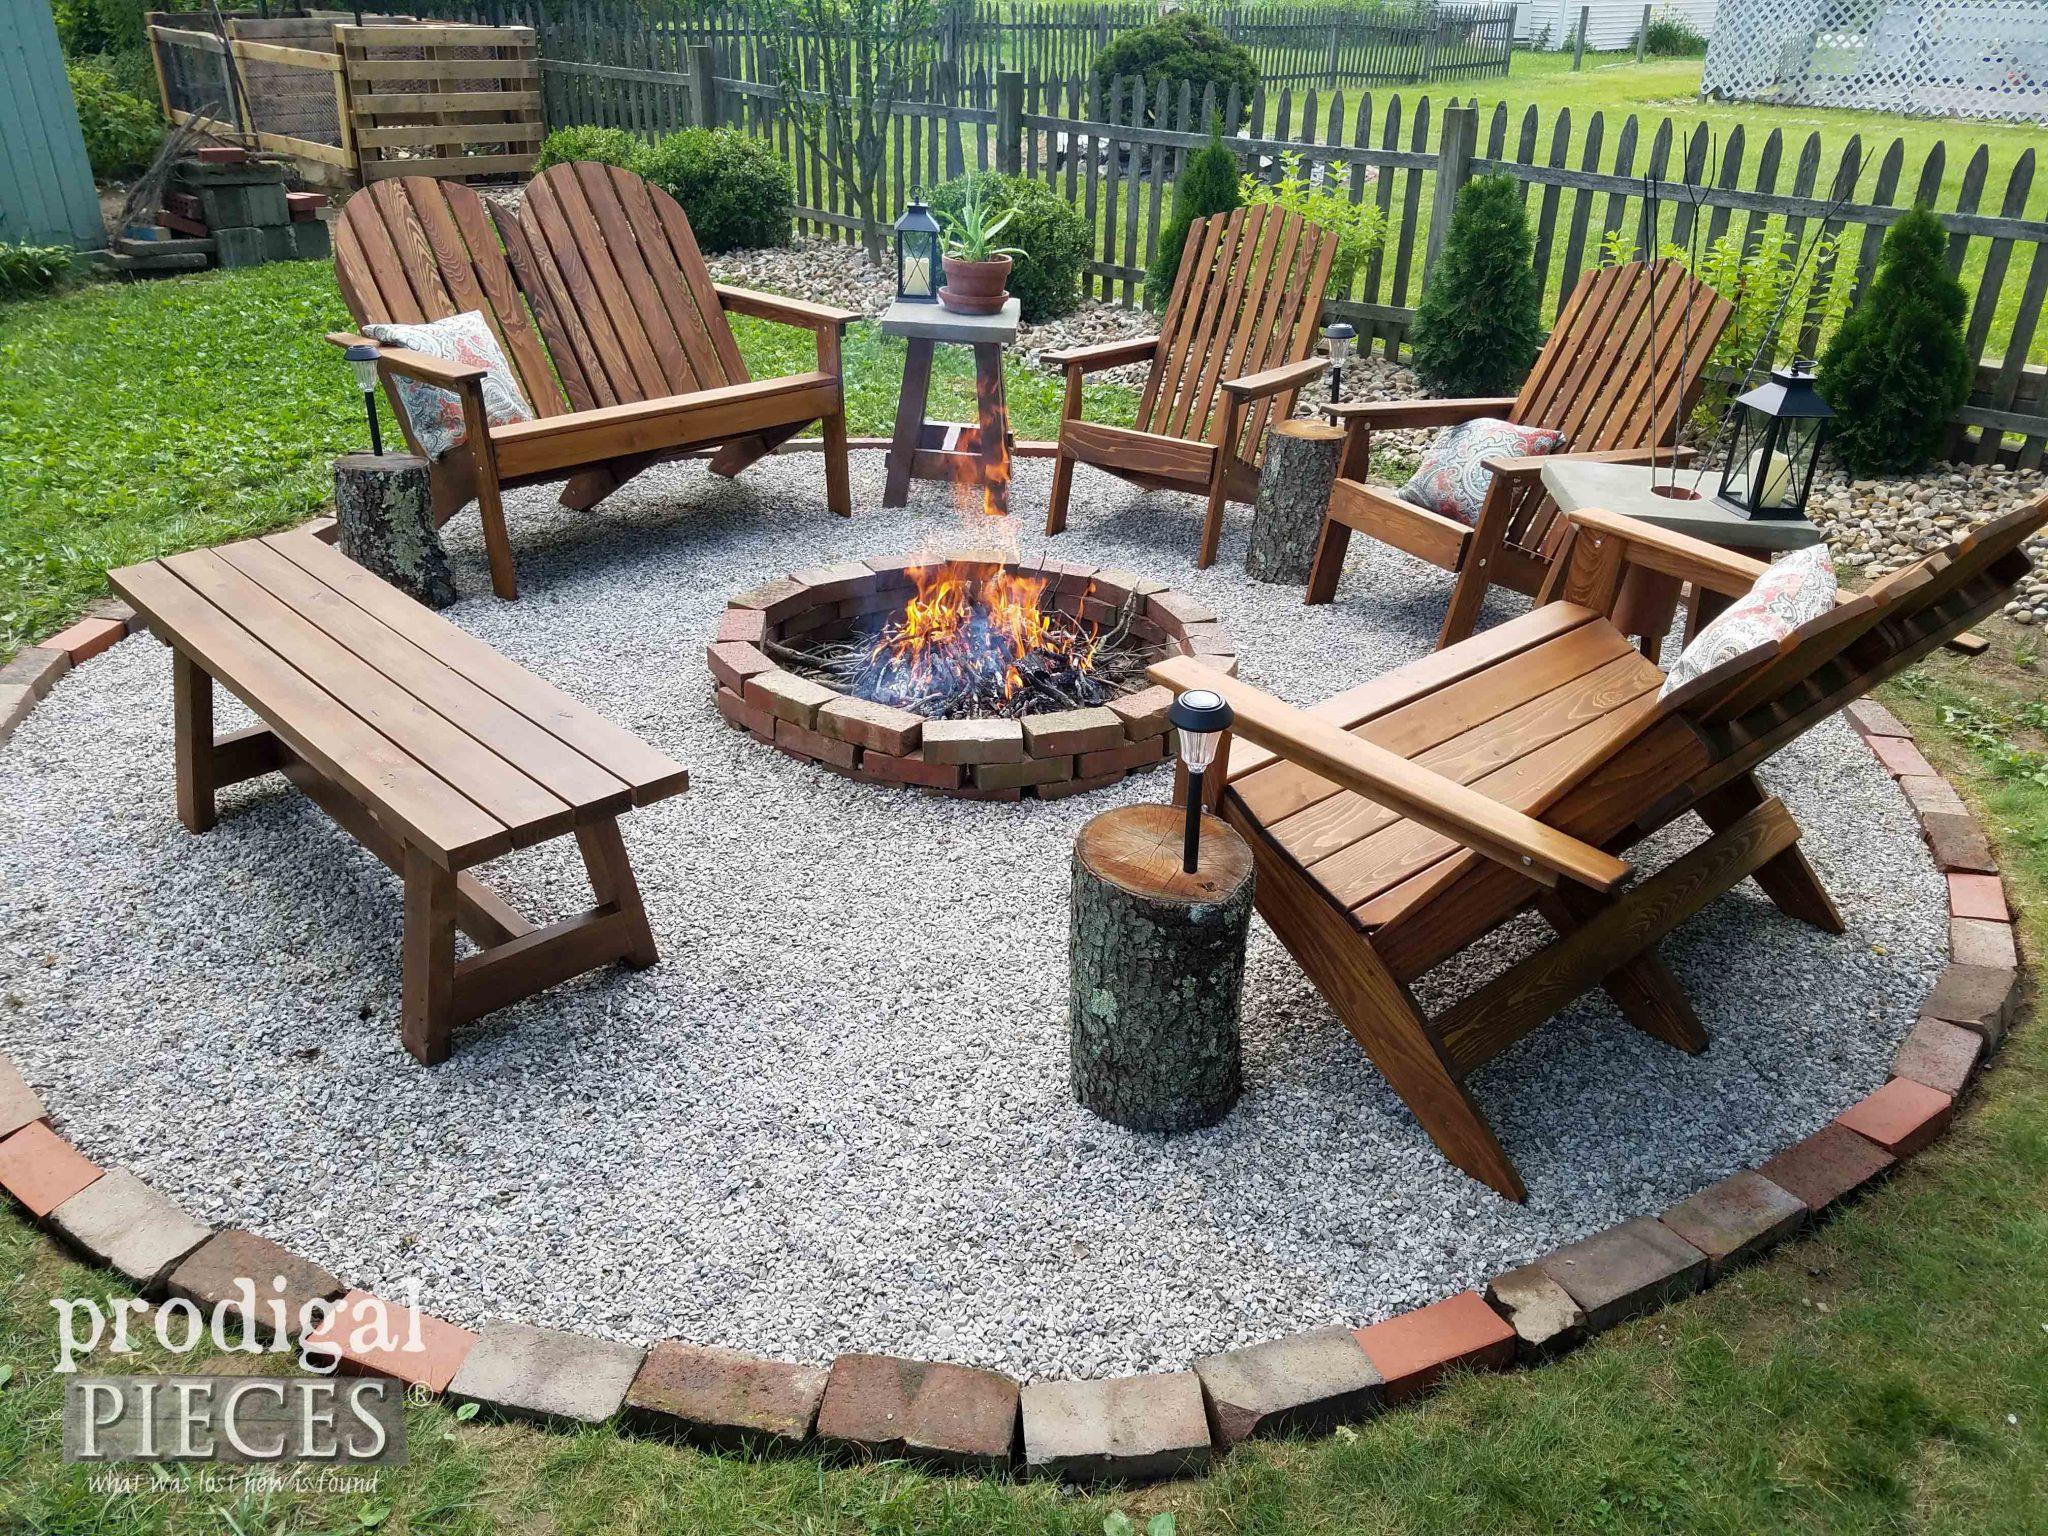 DIY Fire Pit ~ Backyard Budget Decor - Prodigal Pieces on Backyard Fire Pit Ideas Diy id=48147